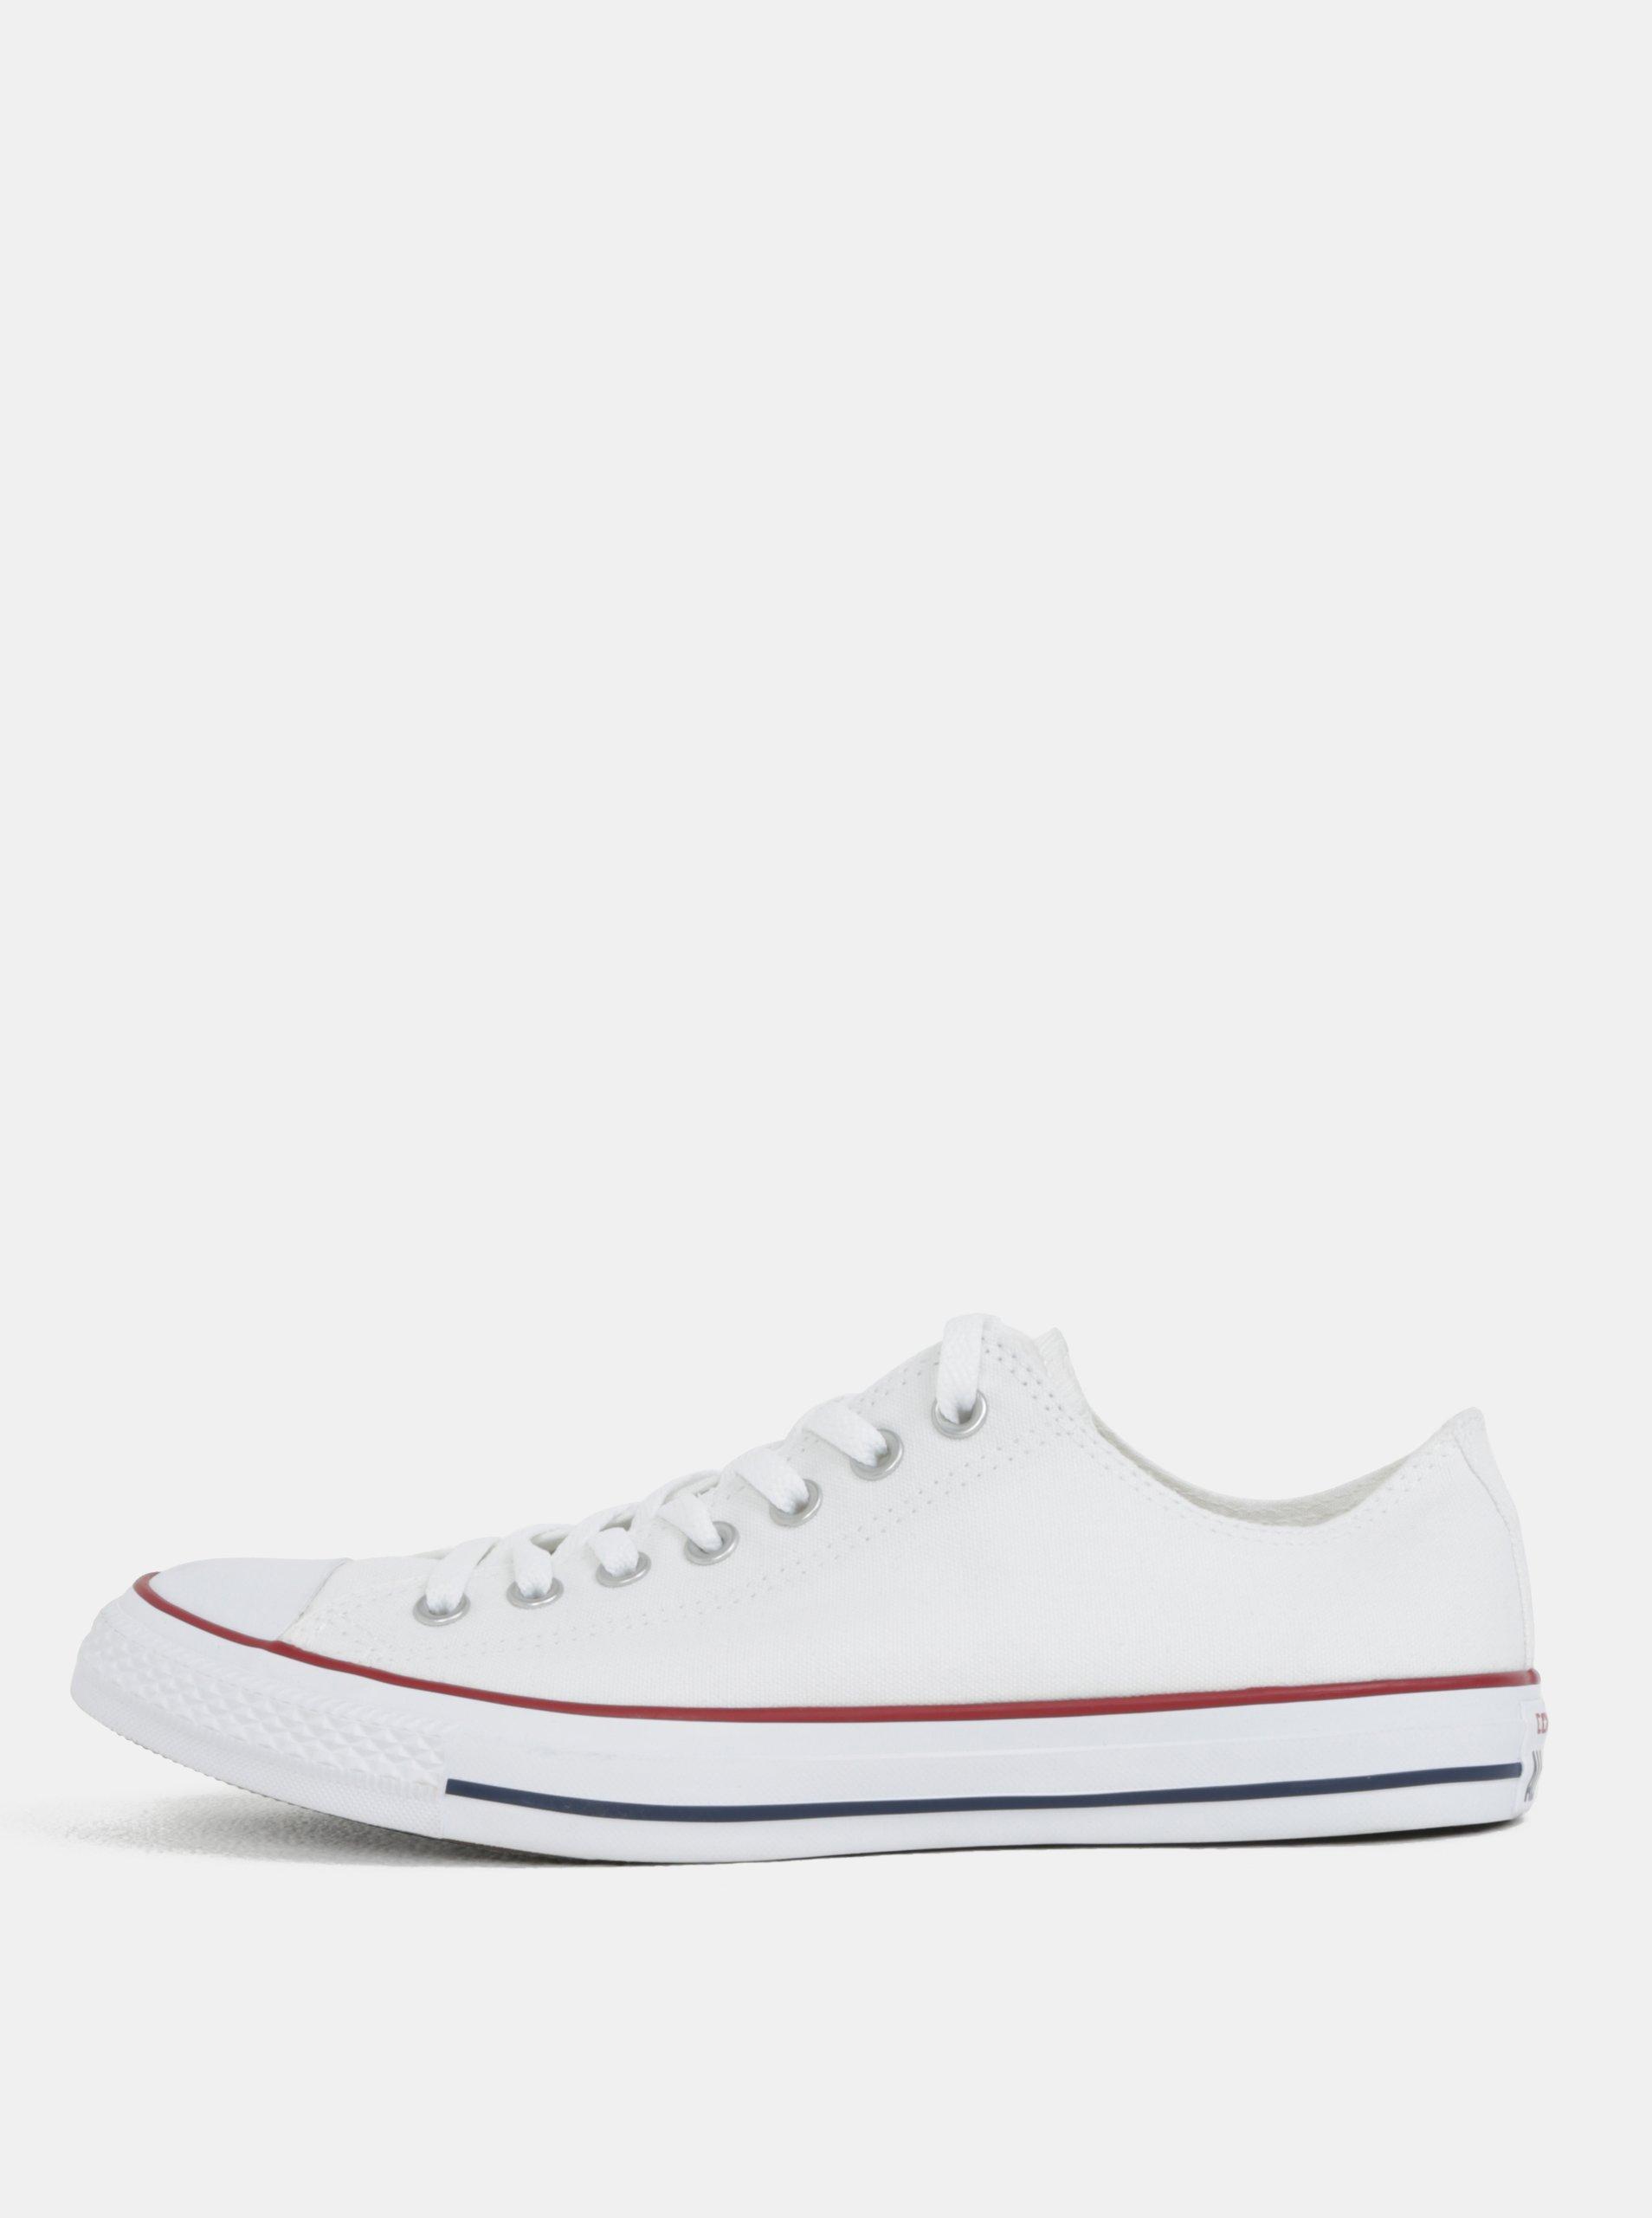 Biele tenisky Converse Chuck Taylor All Star